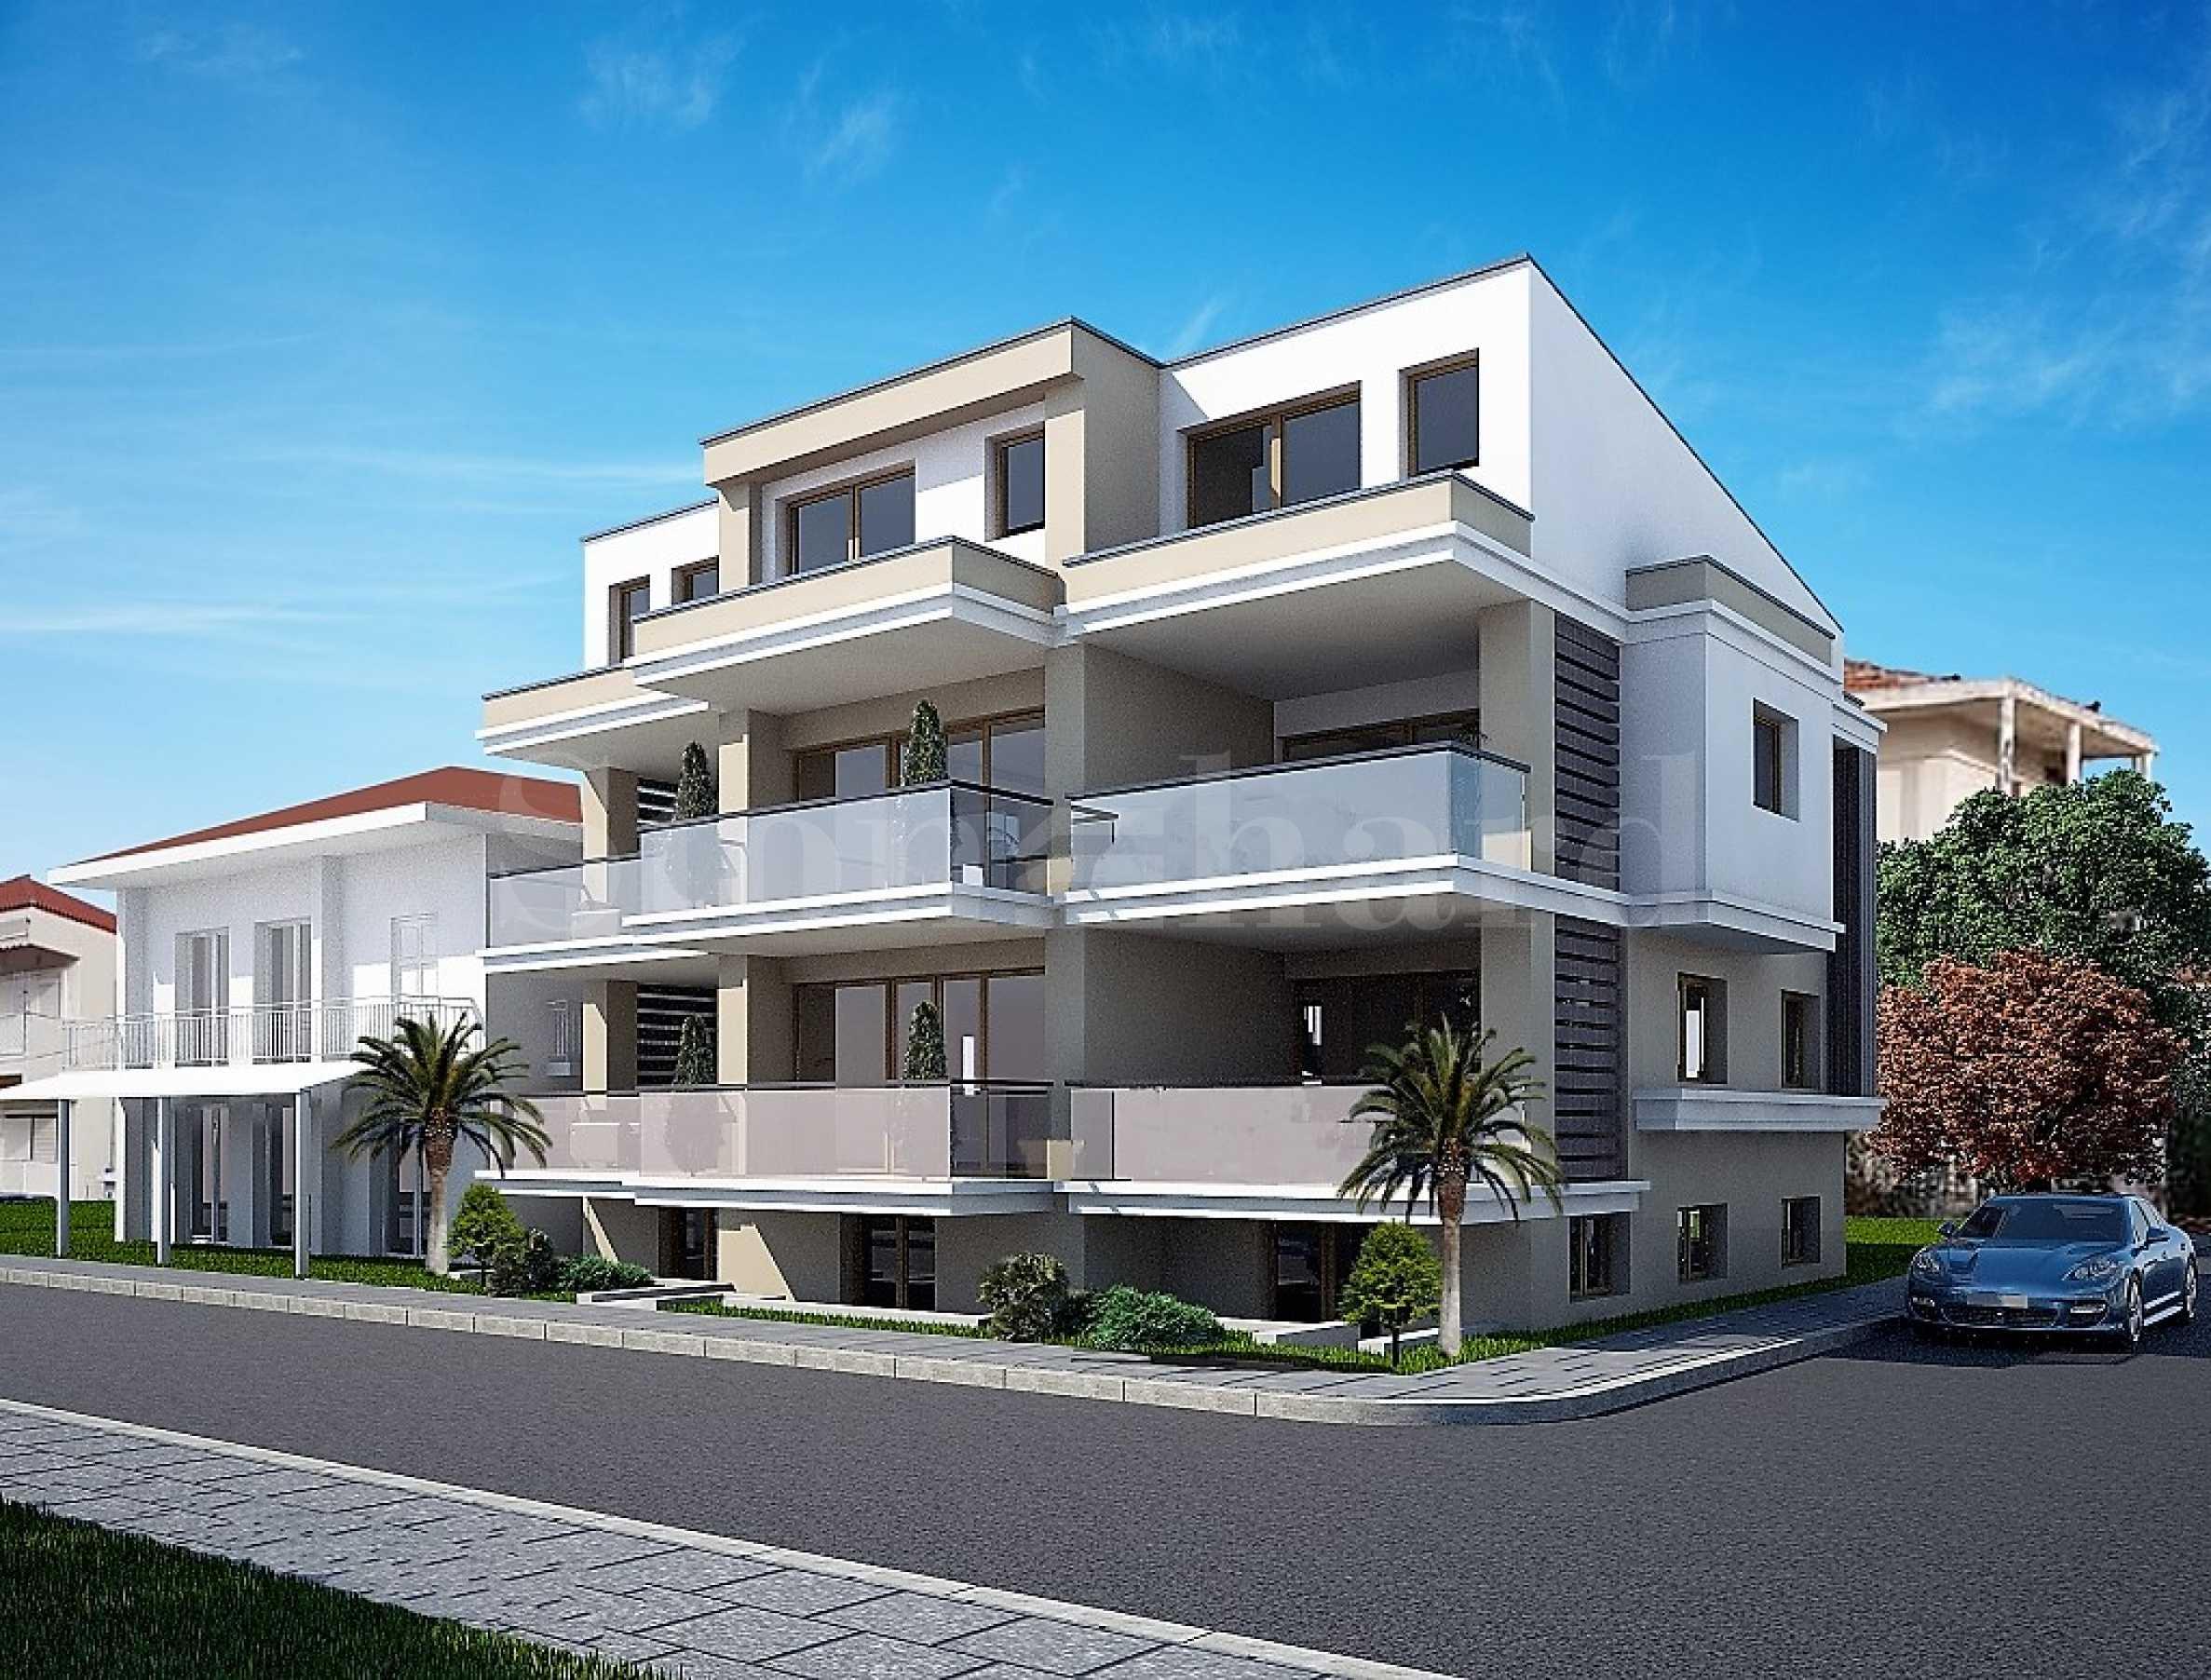 2-bedroom apartment in 1 - Stonehard